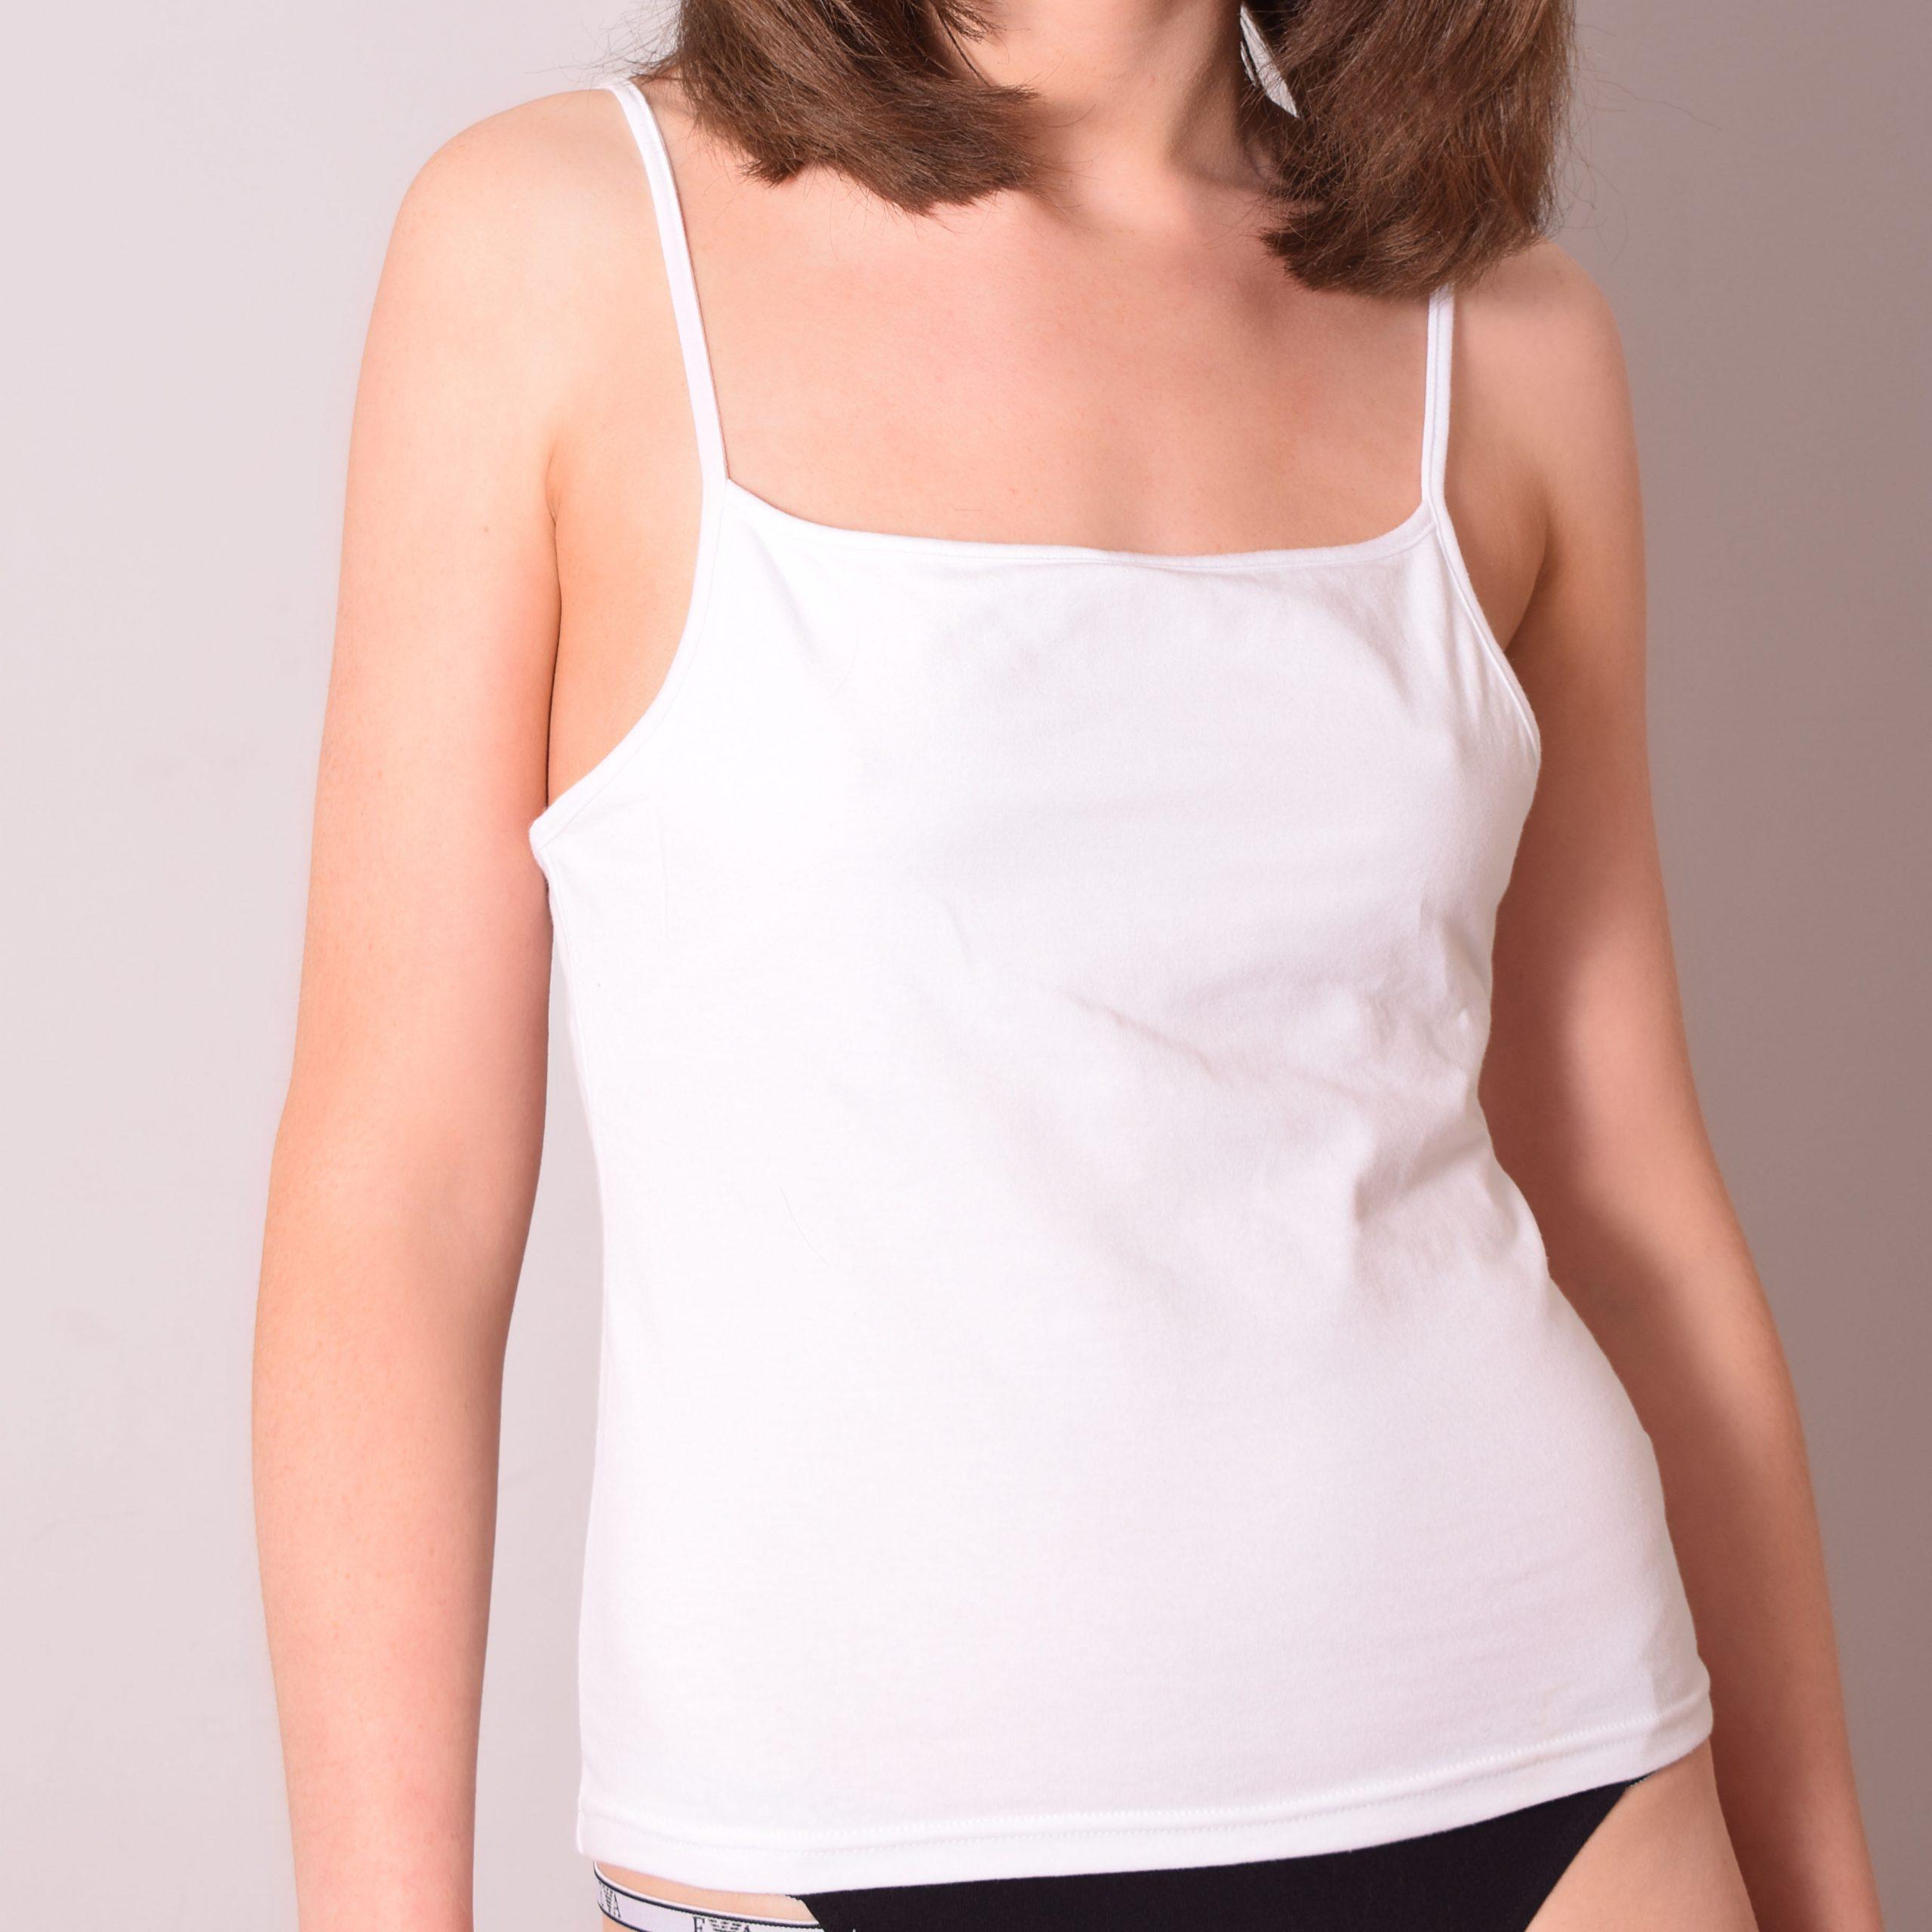 Ladies Support vest